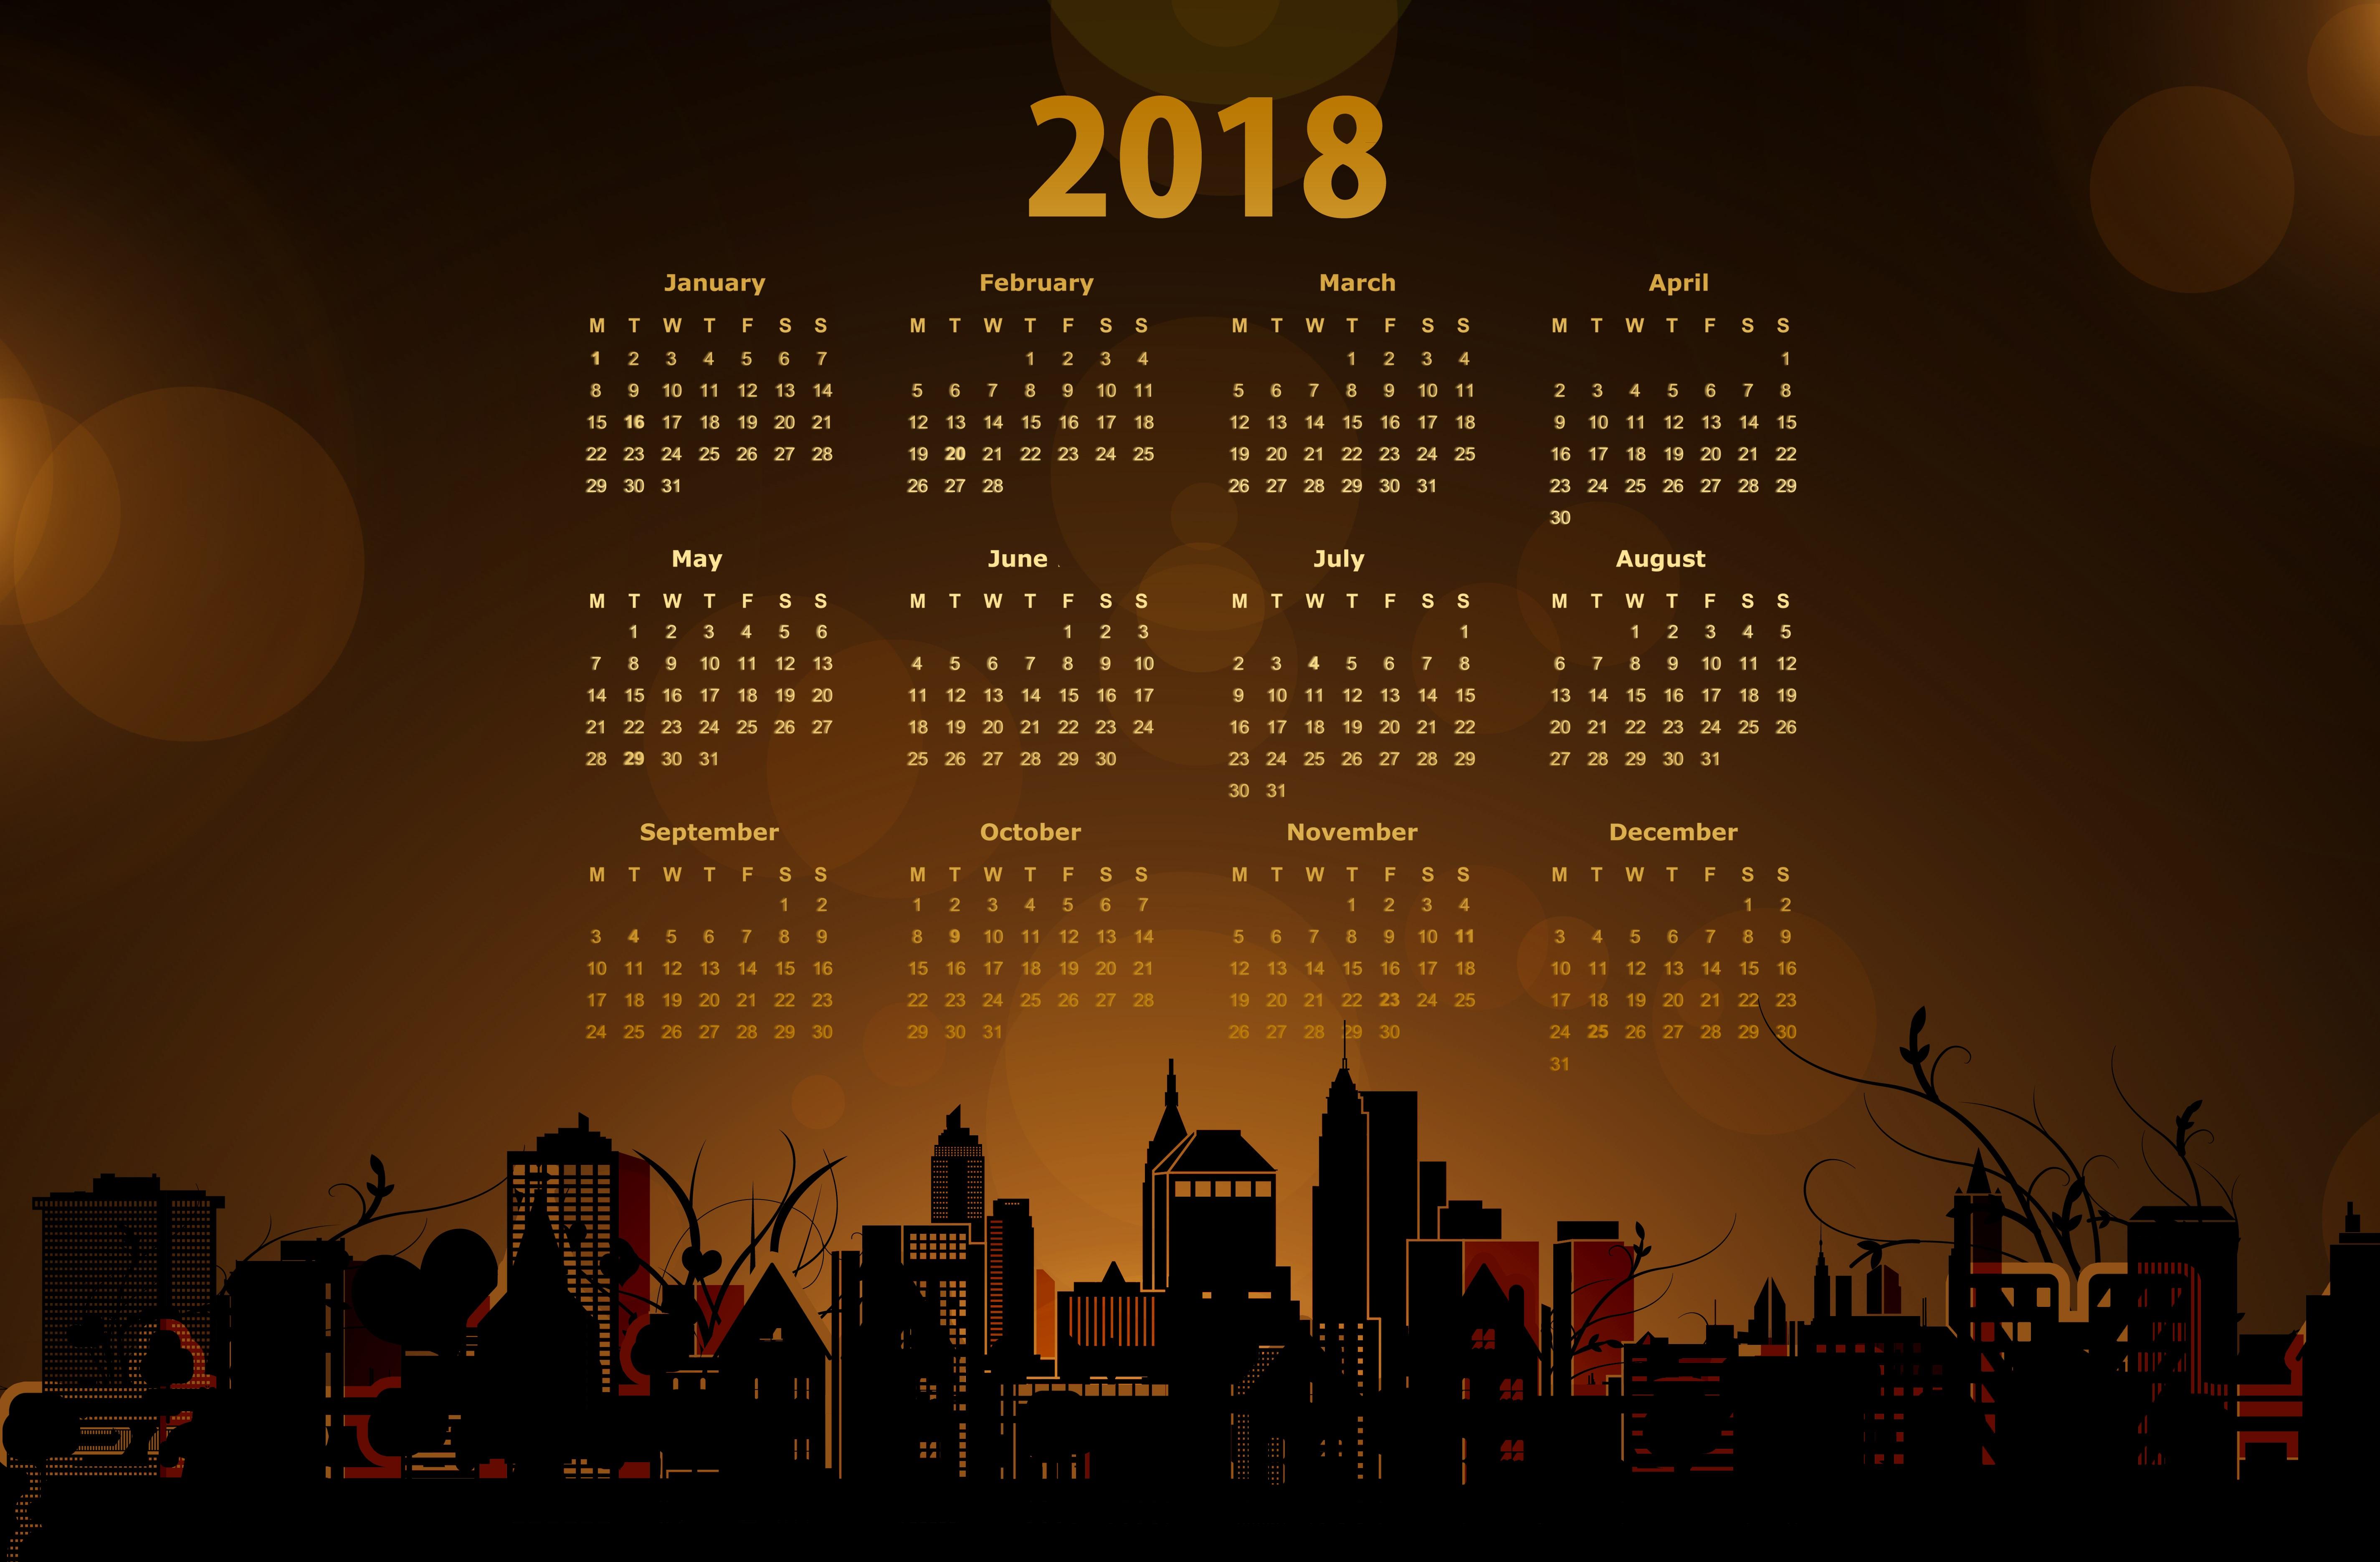 2018 Calendar with a Cityscape 5k Retina Ultra HD 5700x3741